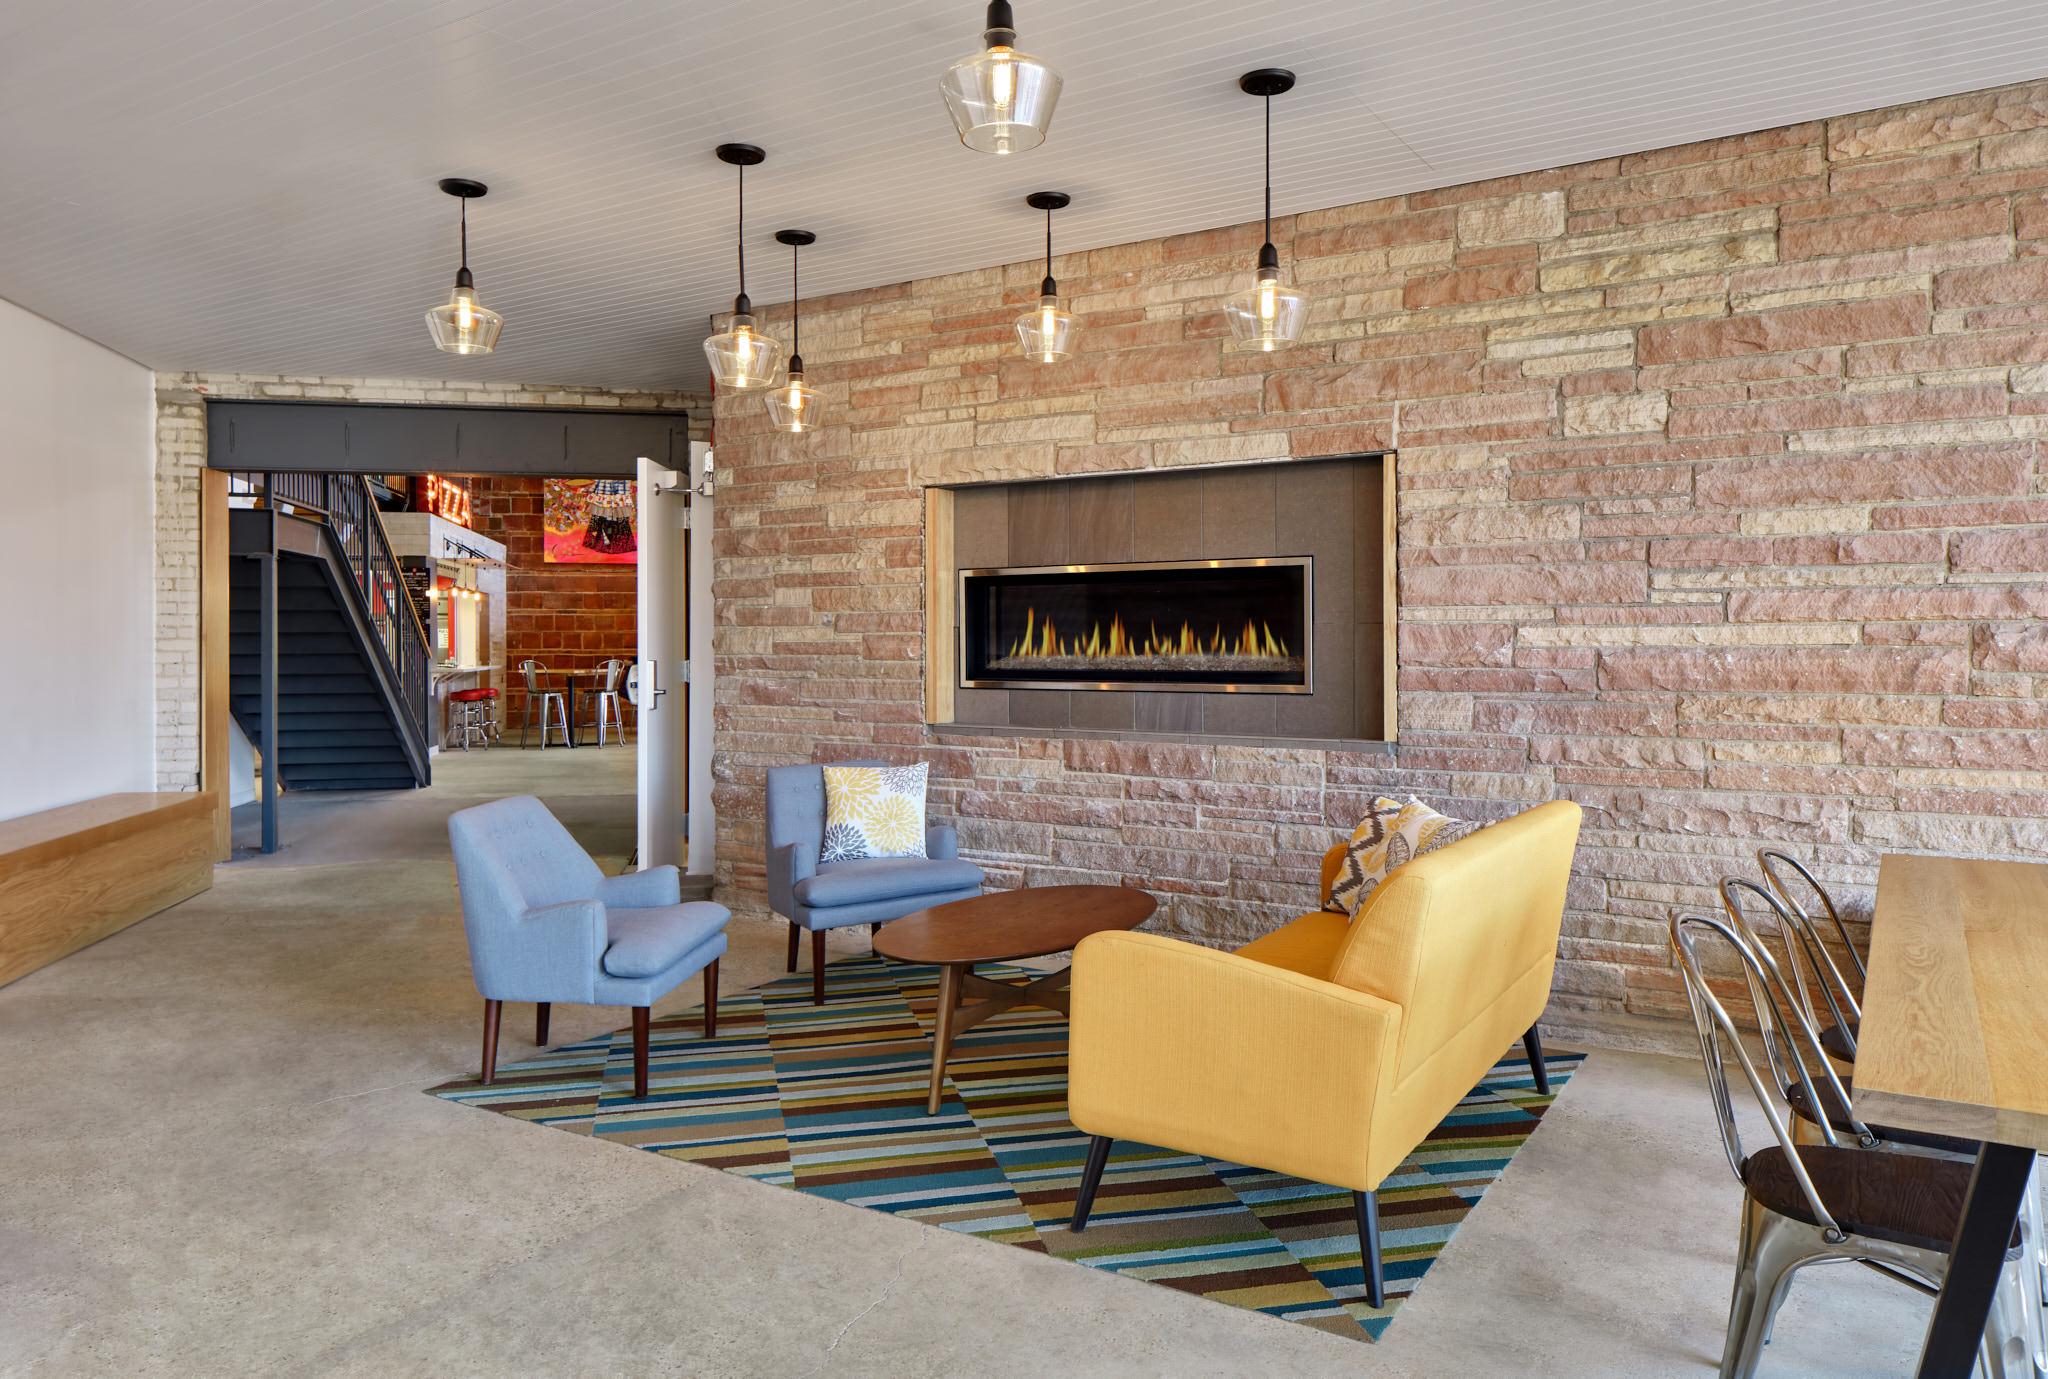 Sherman Phoenix, HGA, Architecture, Interiors